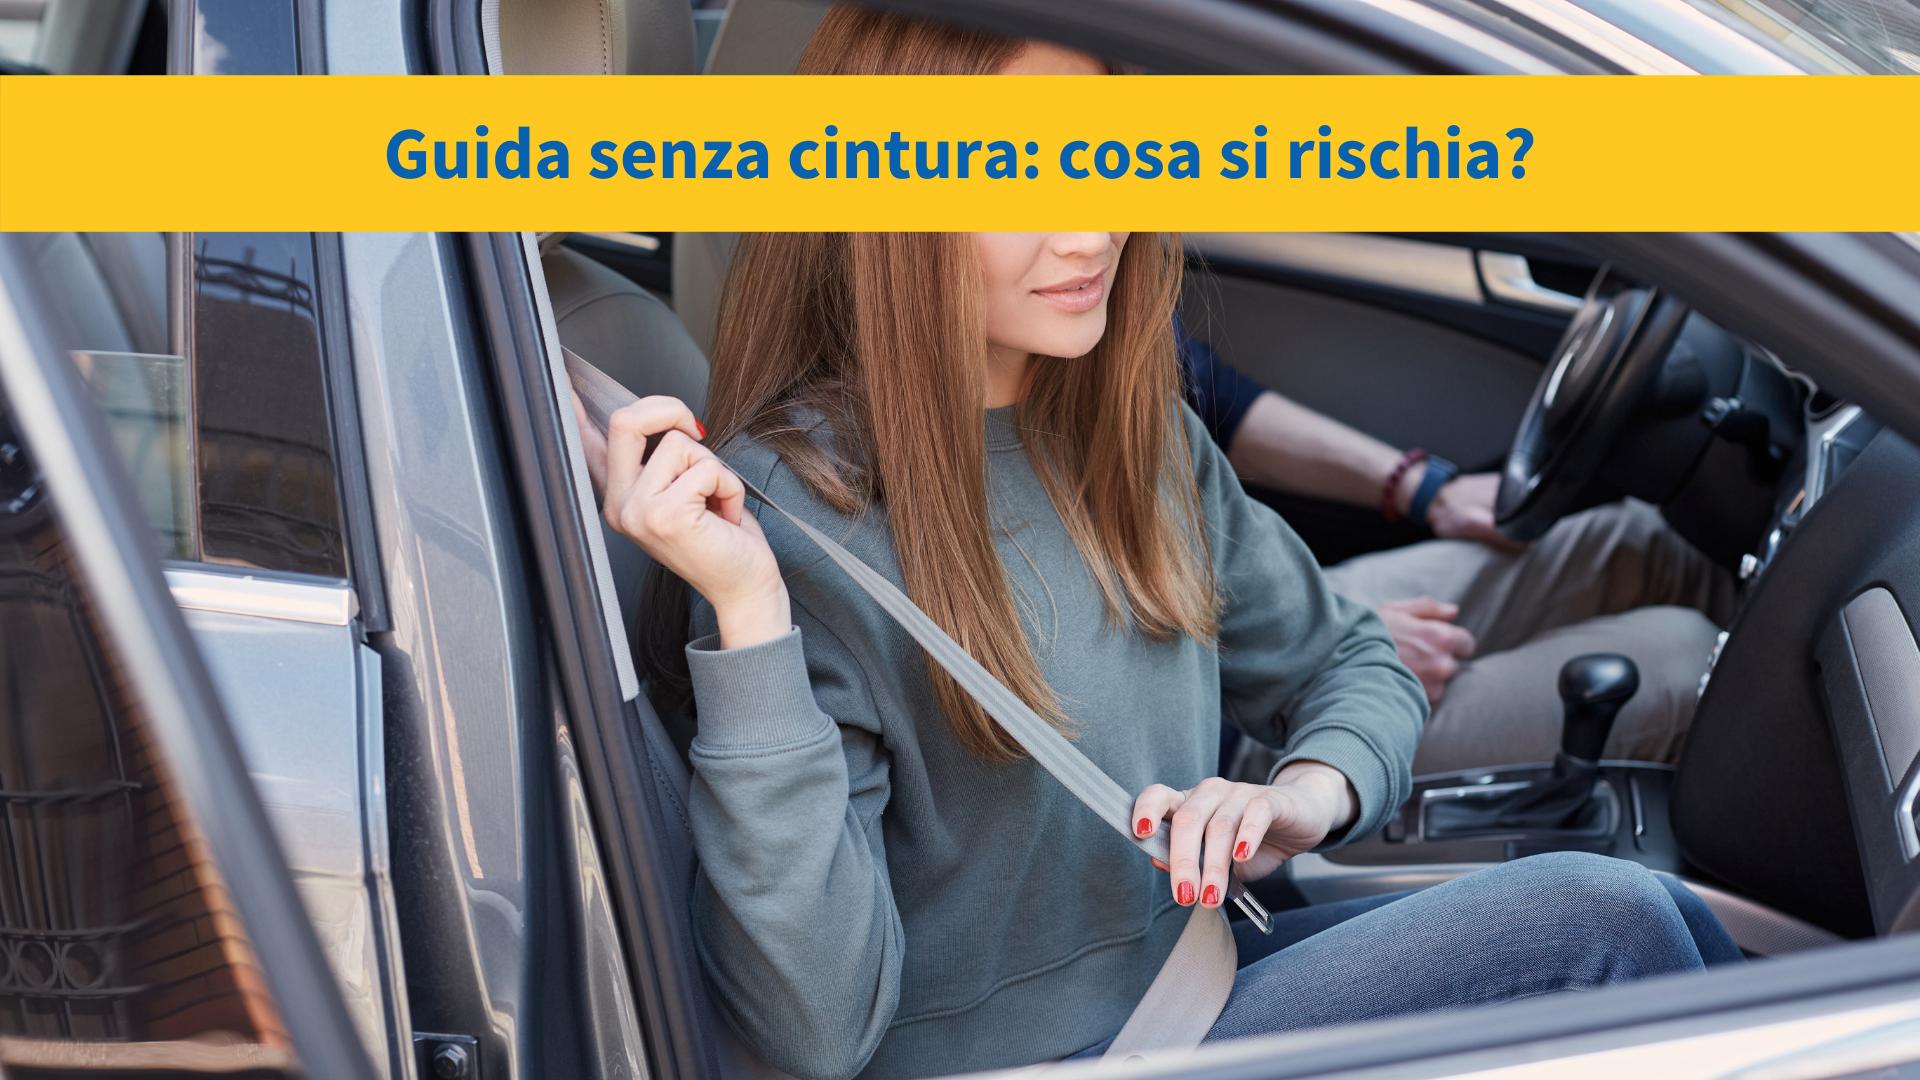 Guida senza cintura: cosa si rischia?